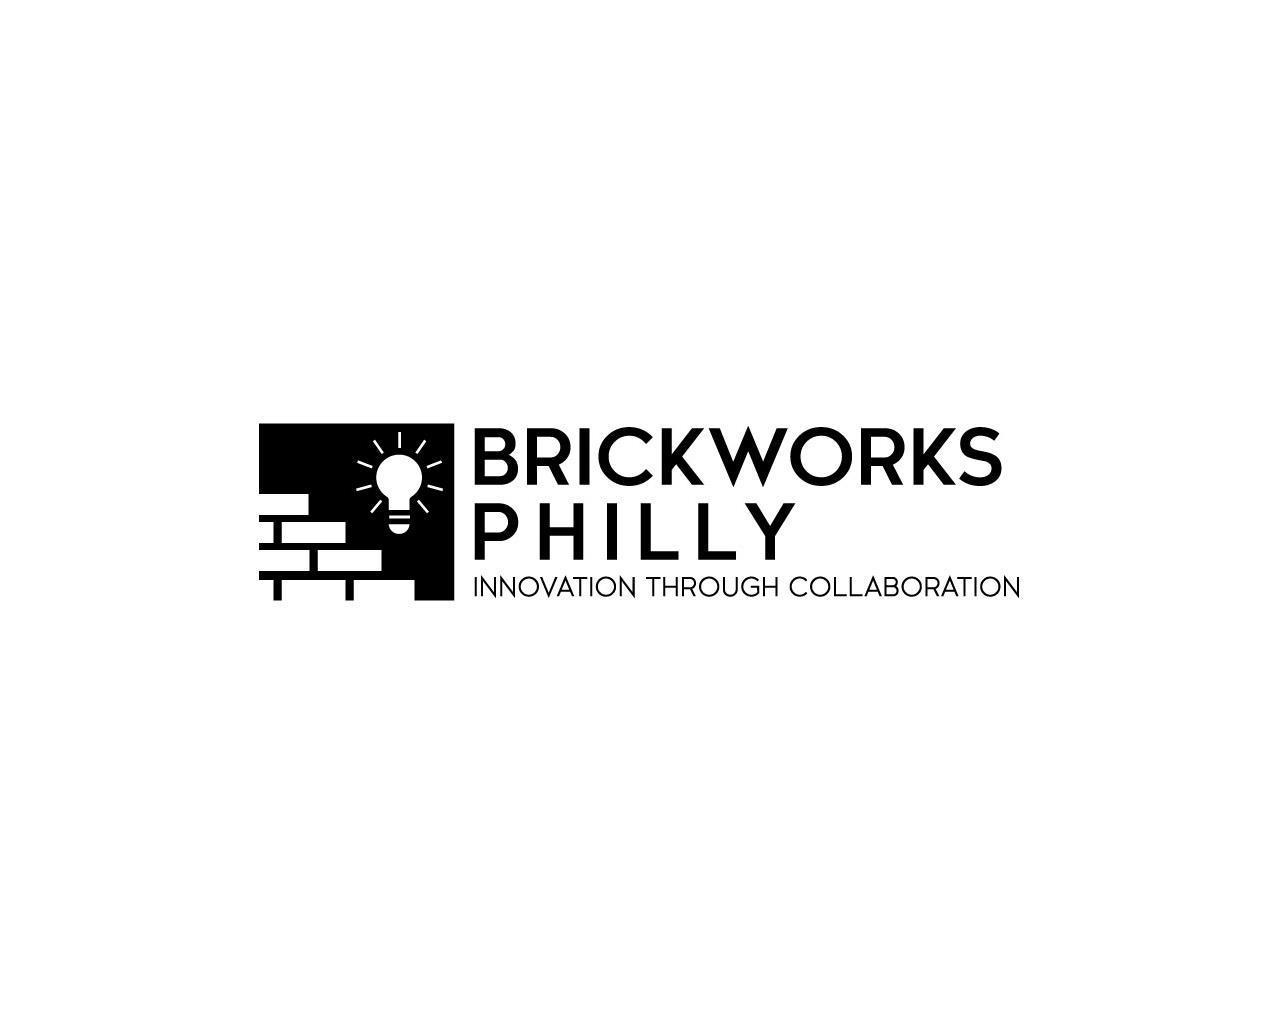 Logo of Brickworks Philly